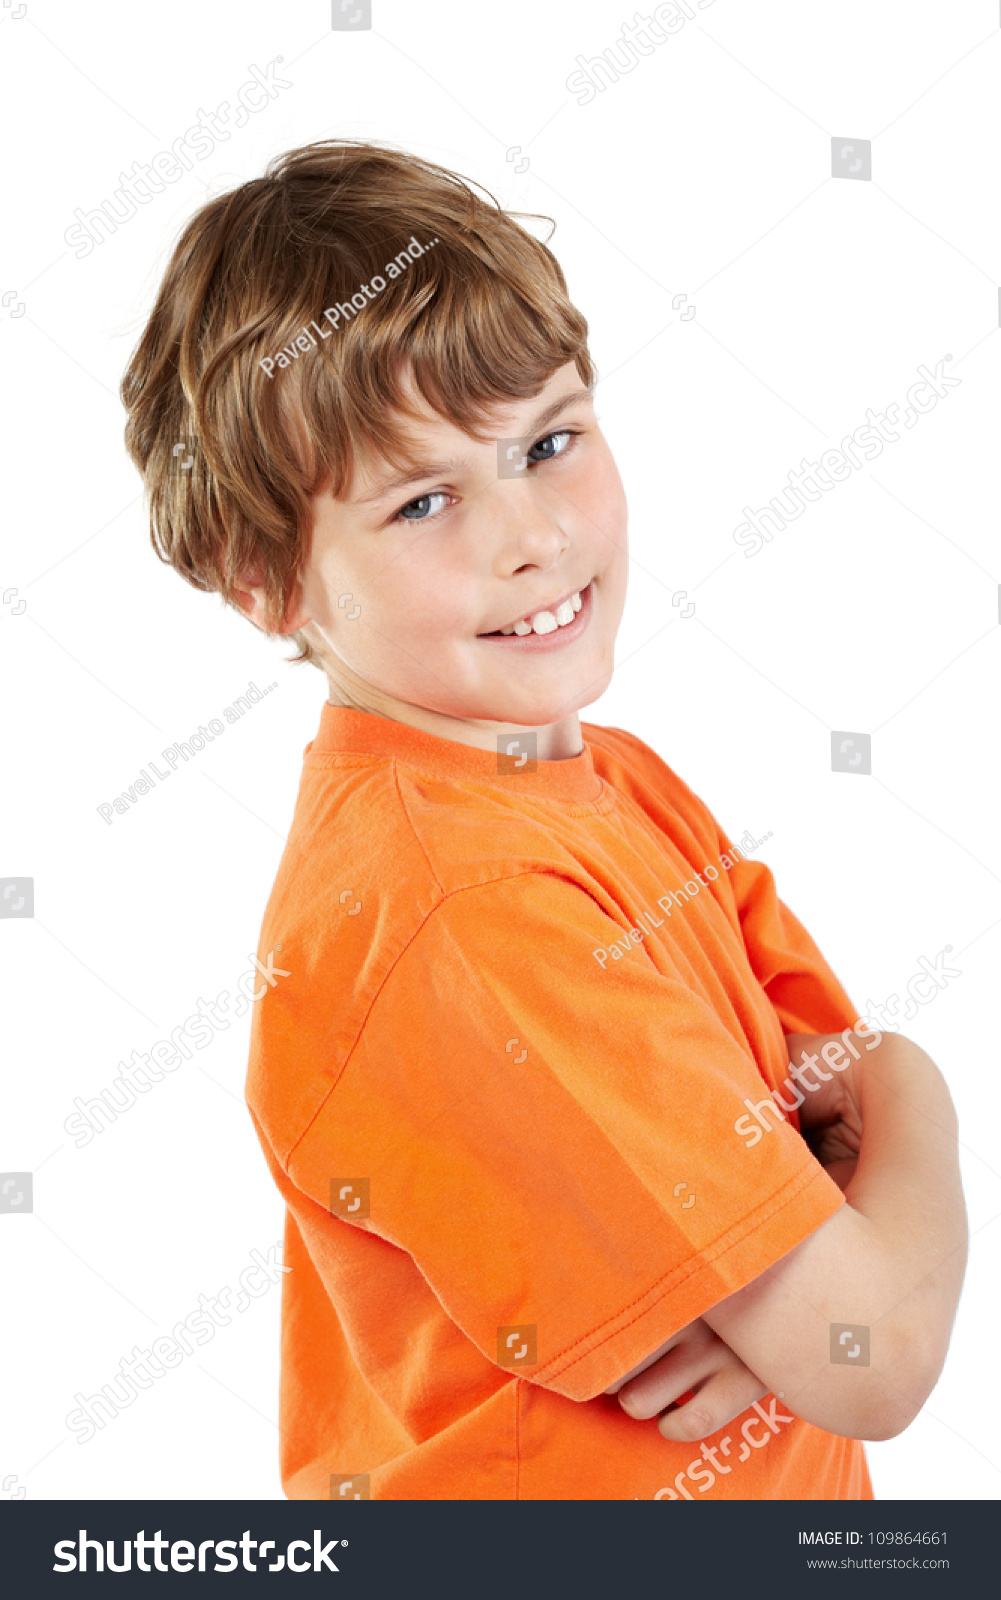 Pavel boy model